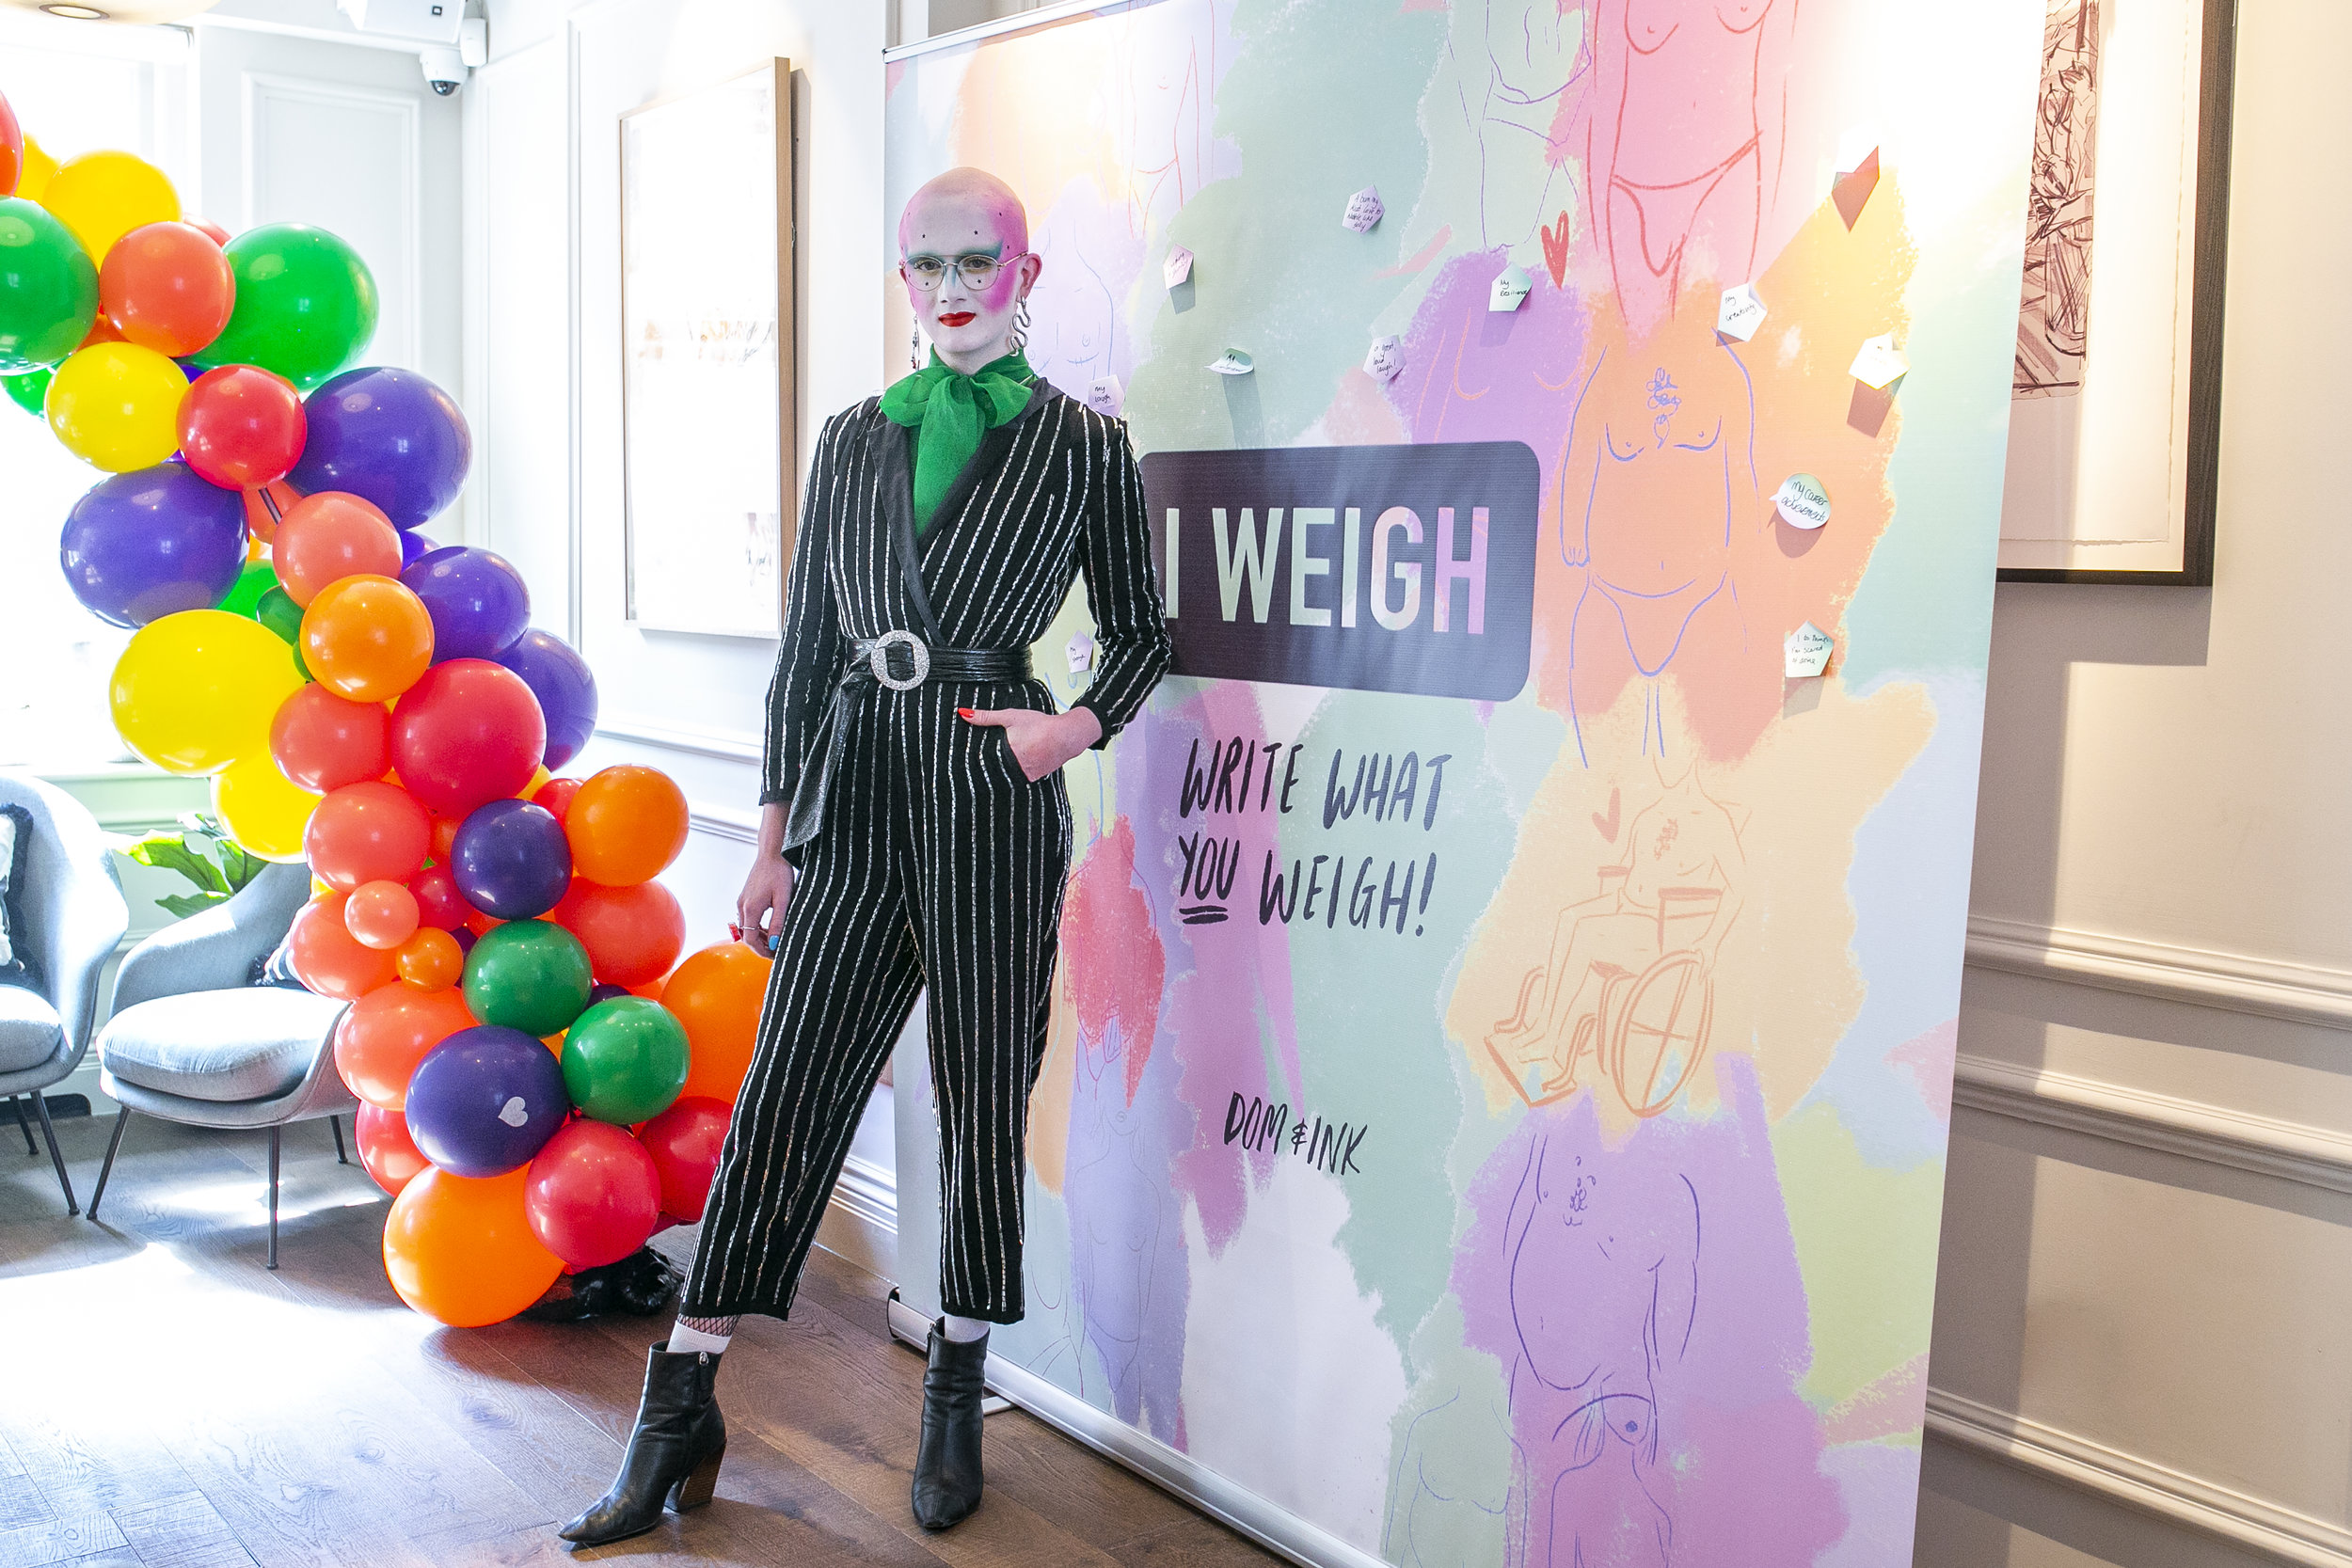 I Weigh 63_High Res.jpg